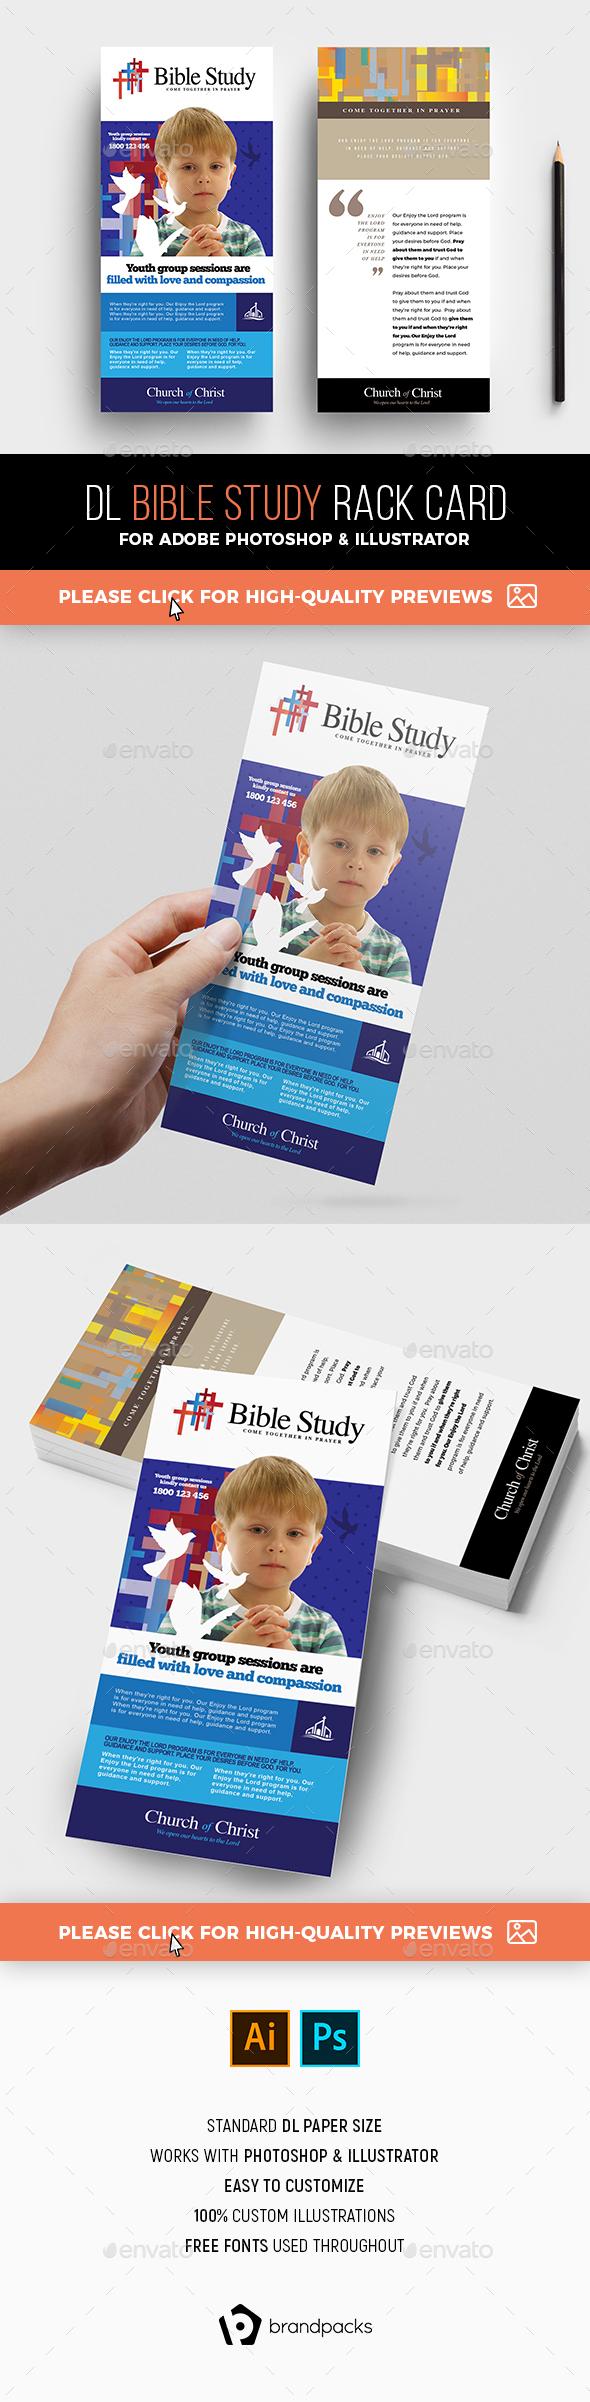 Bible Study Rack Card Template - Church Flyers